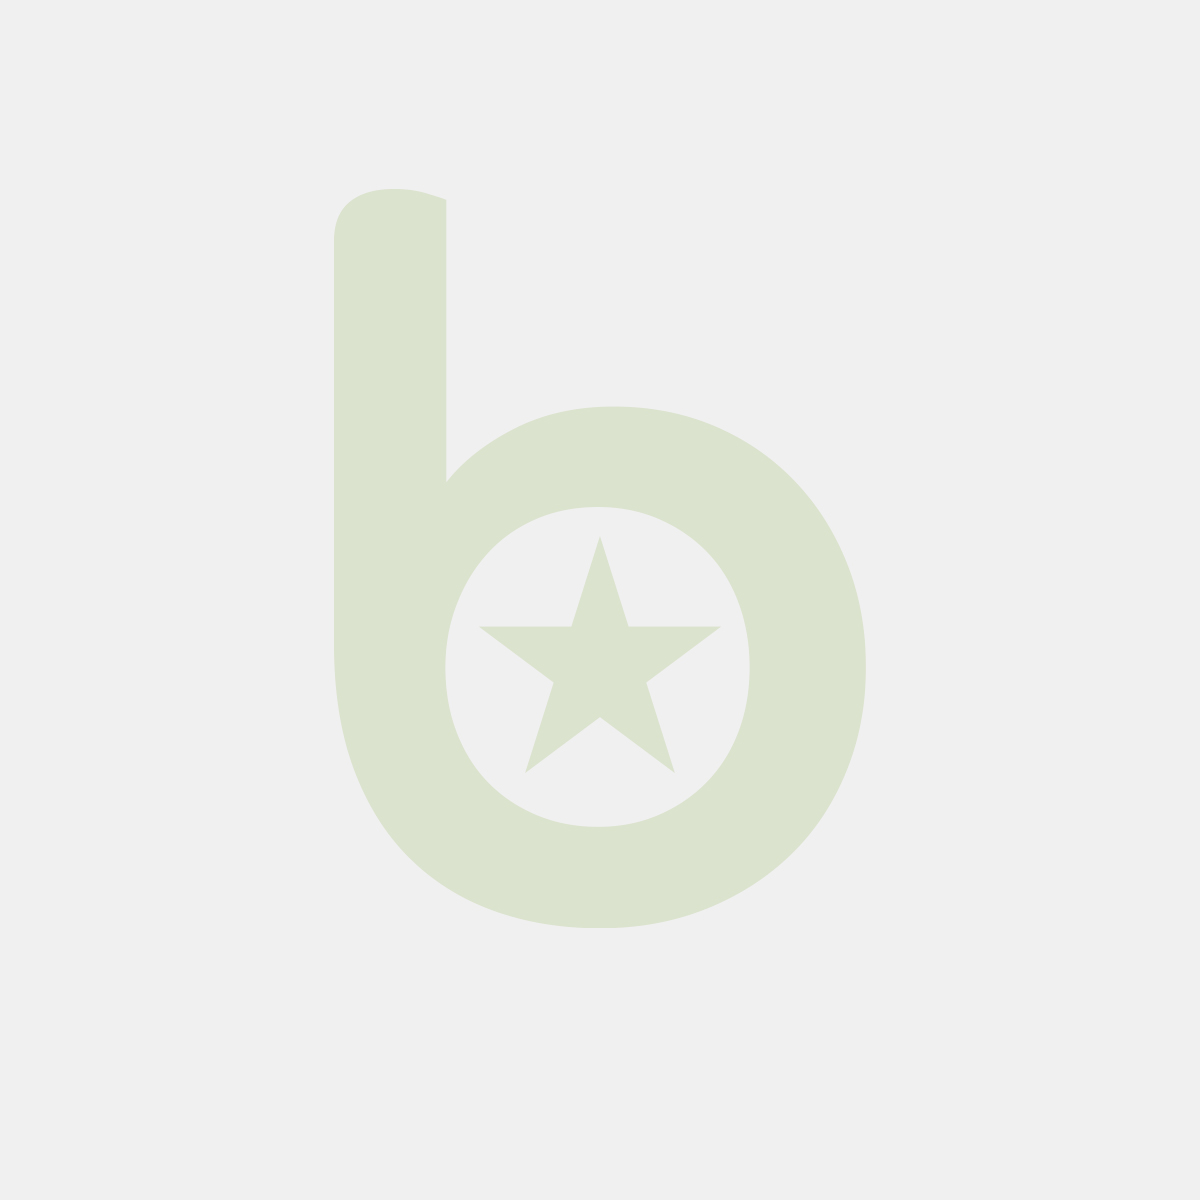 Fingerfood - Patyczki KNOT 6cm op.250szt